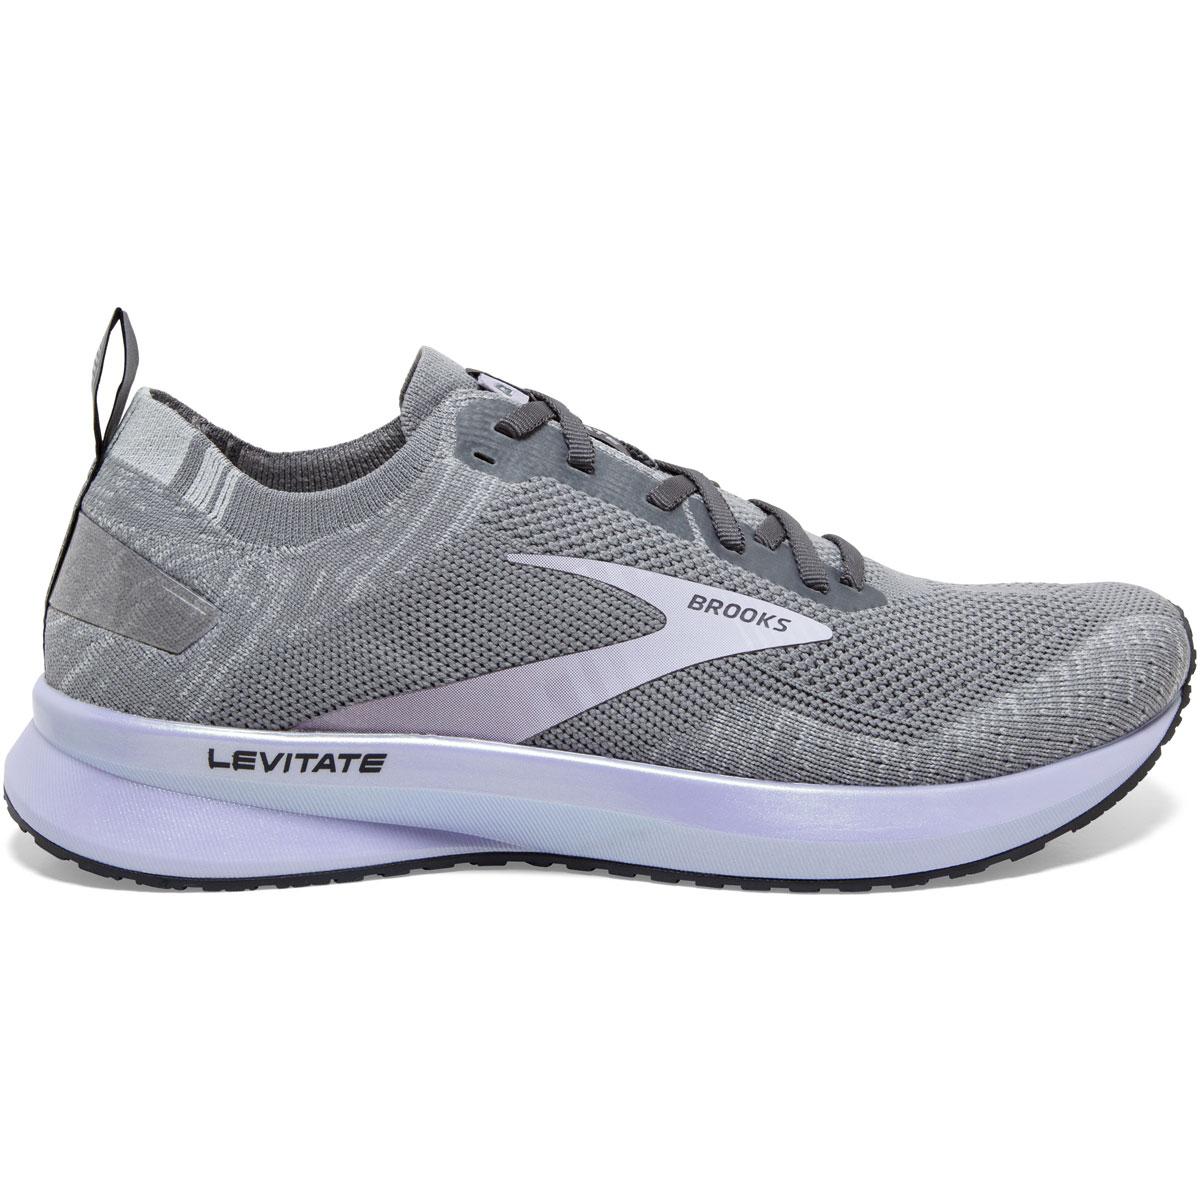 Women's Brooks Levitate 4 Running Shoe - Color: Grey/Blackened Pearl/Purple - Size: 5 - Width: Regular, Grey/Blackened Pearl/Purple, large, image 1